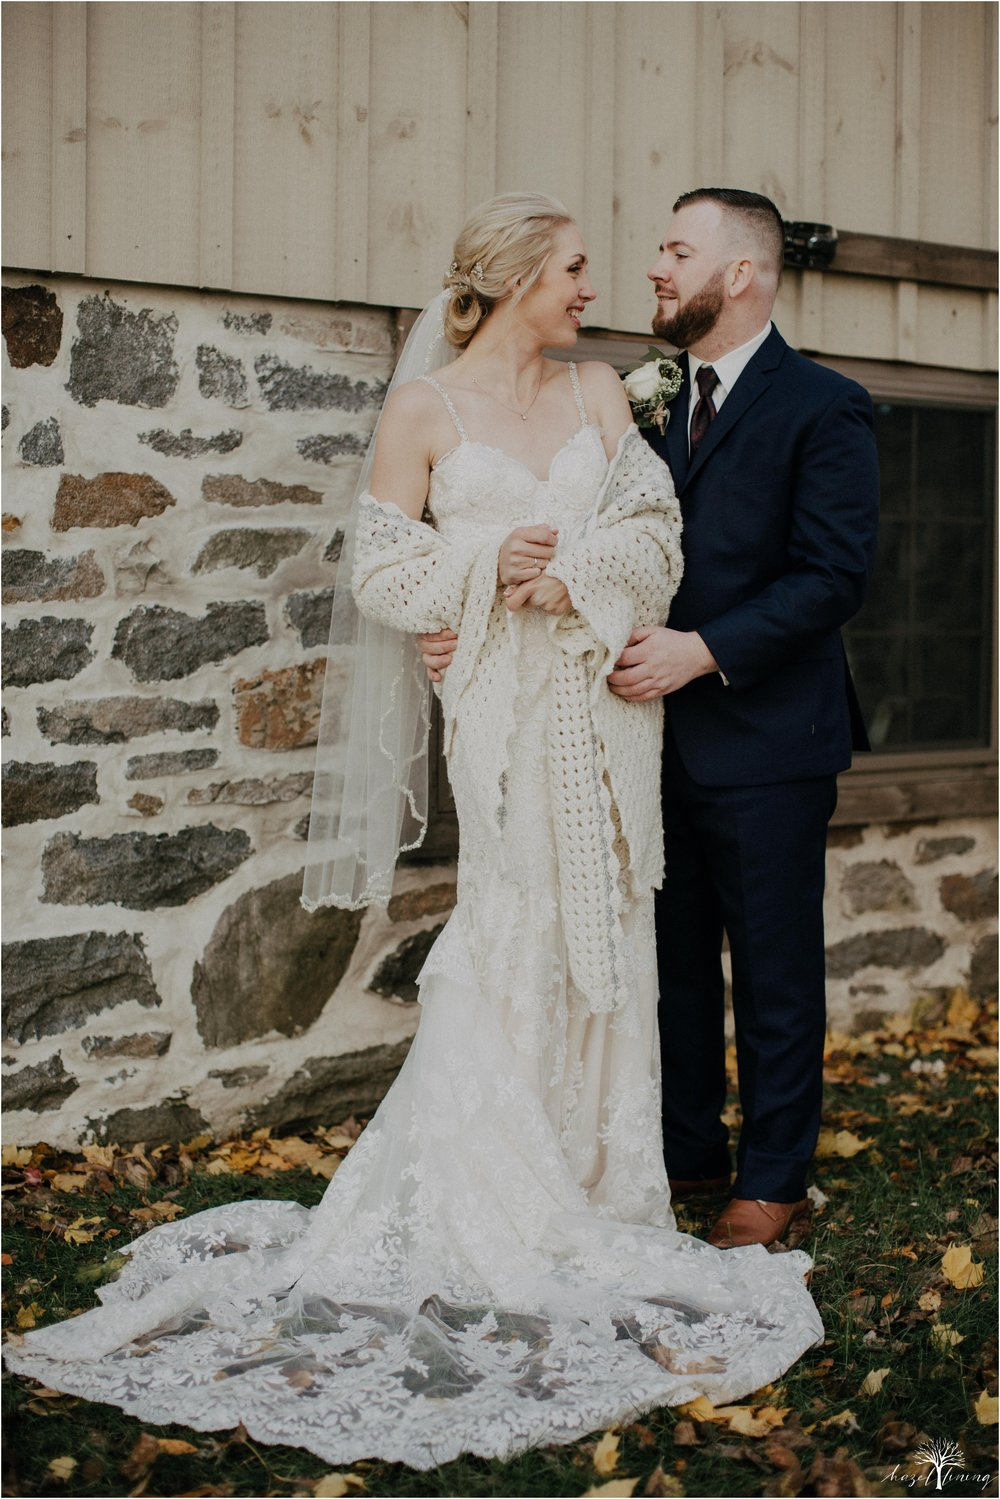 briana-krans-greg-johnston-farm-bakery-and-events-fall-wedding_0075.jpg